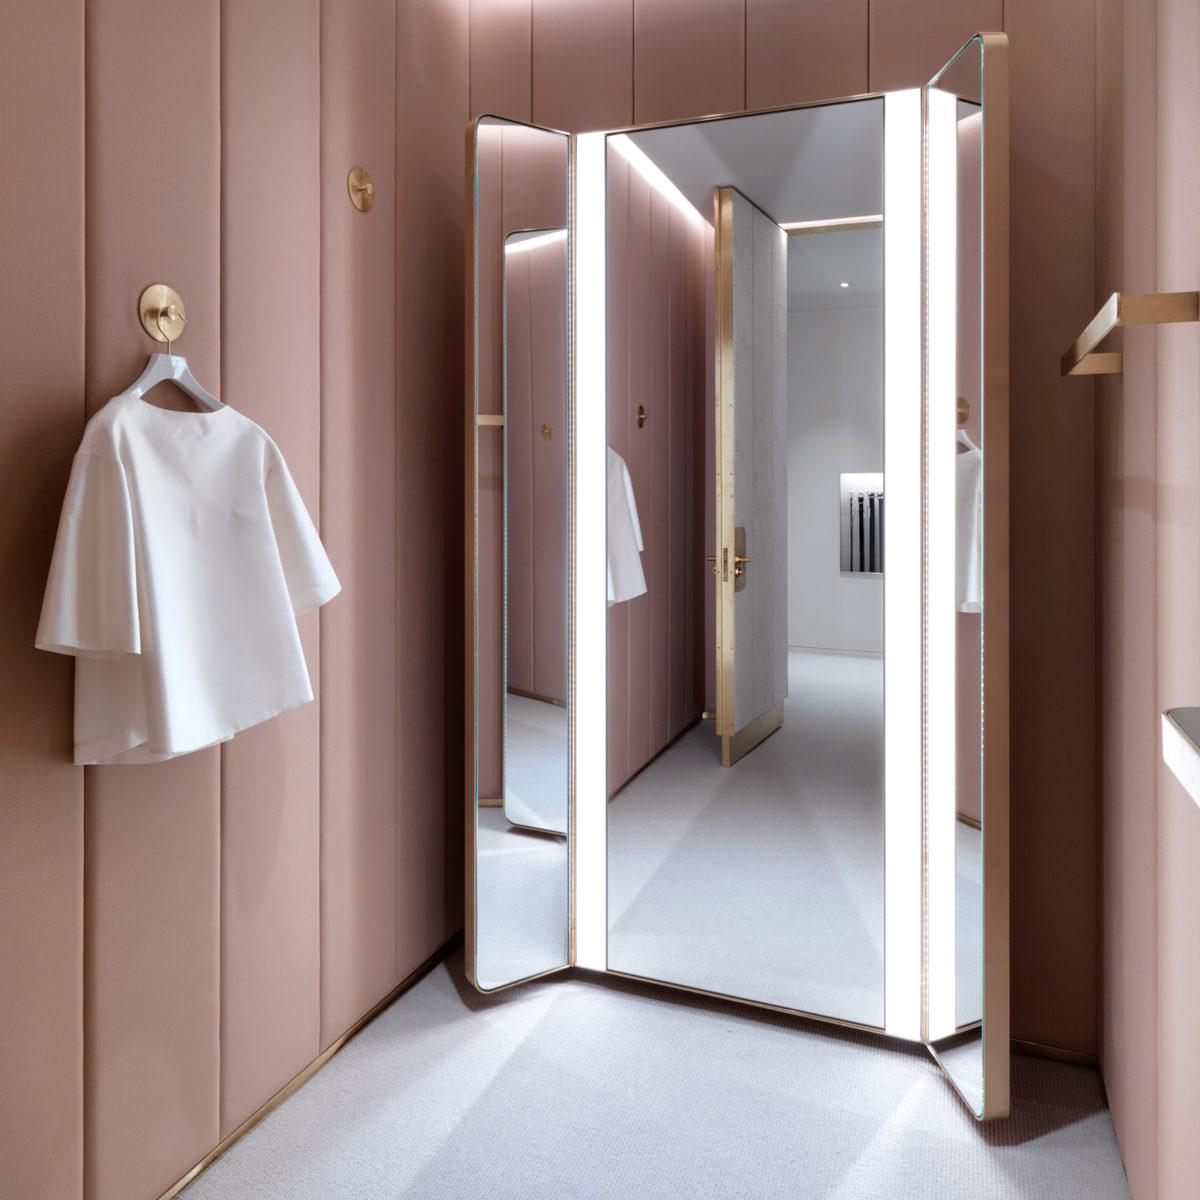 Pink Fever:從精品店到果汁店,10 個粉紅色室內設計打造充滿夢幻質感 7